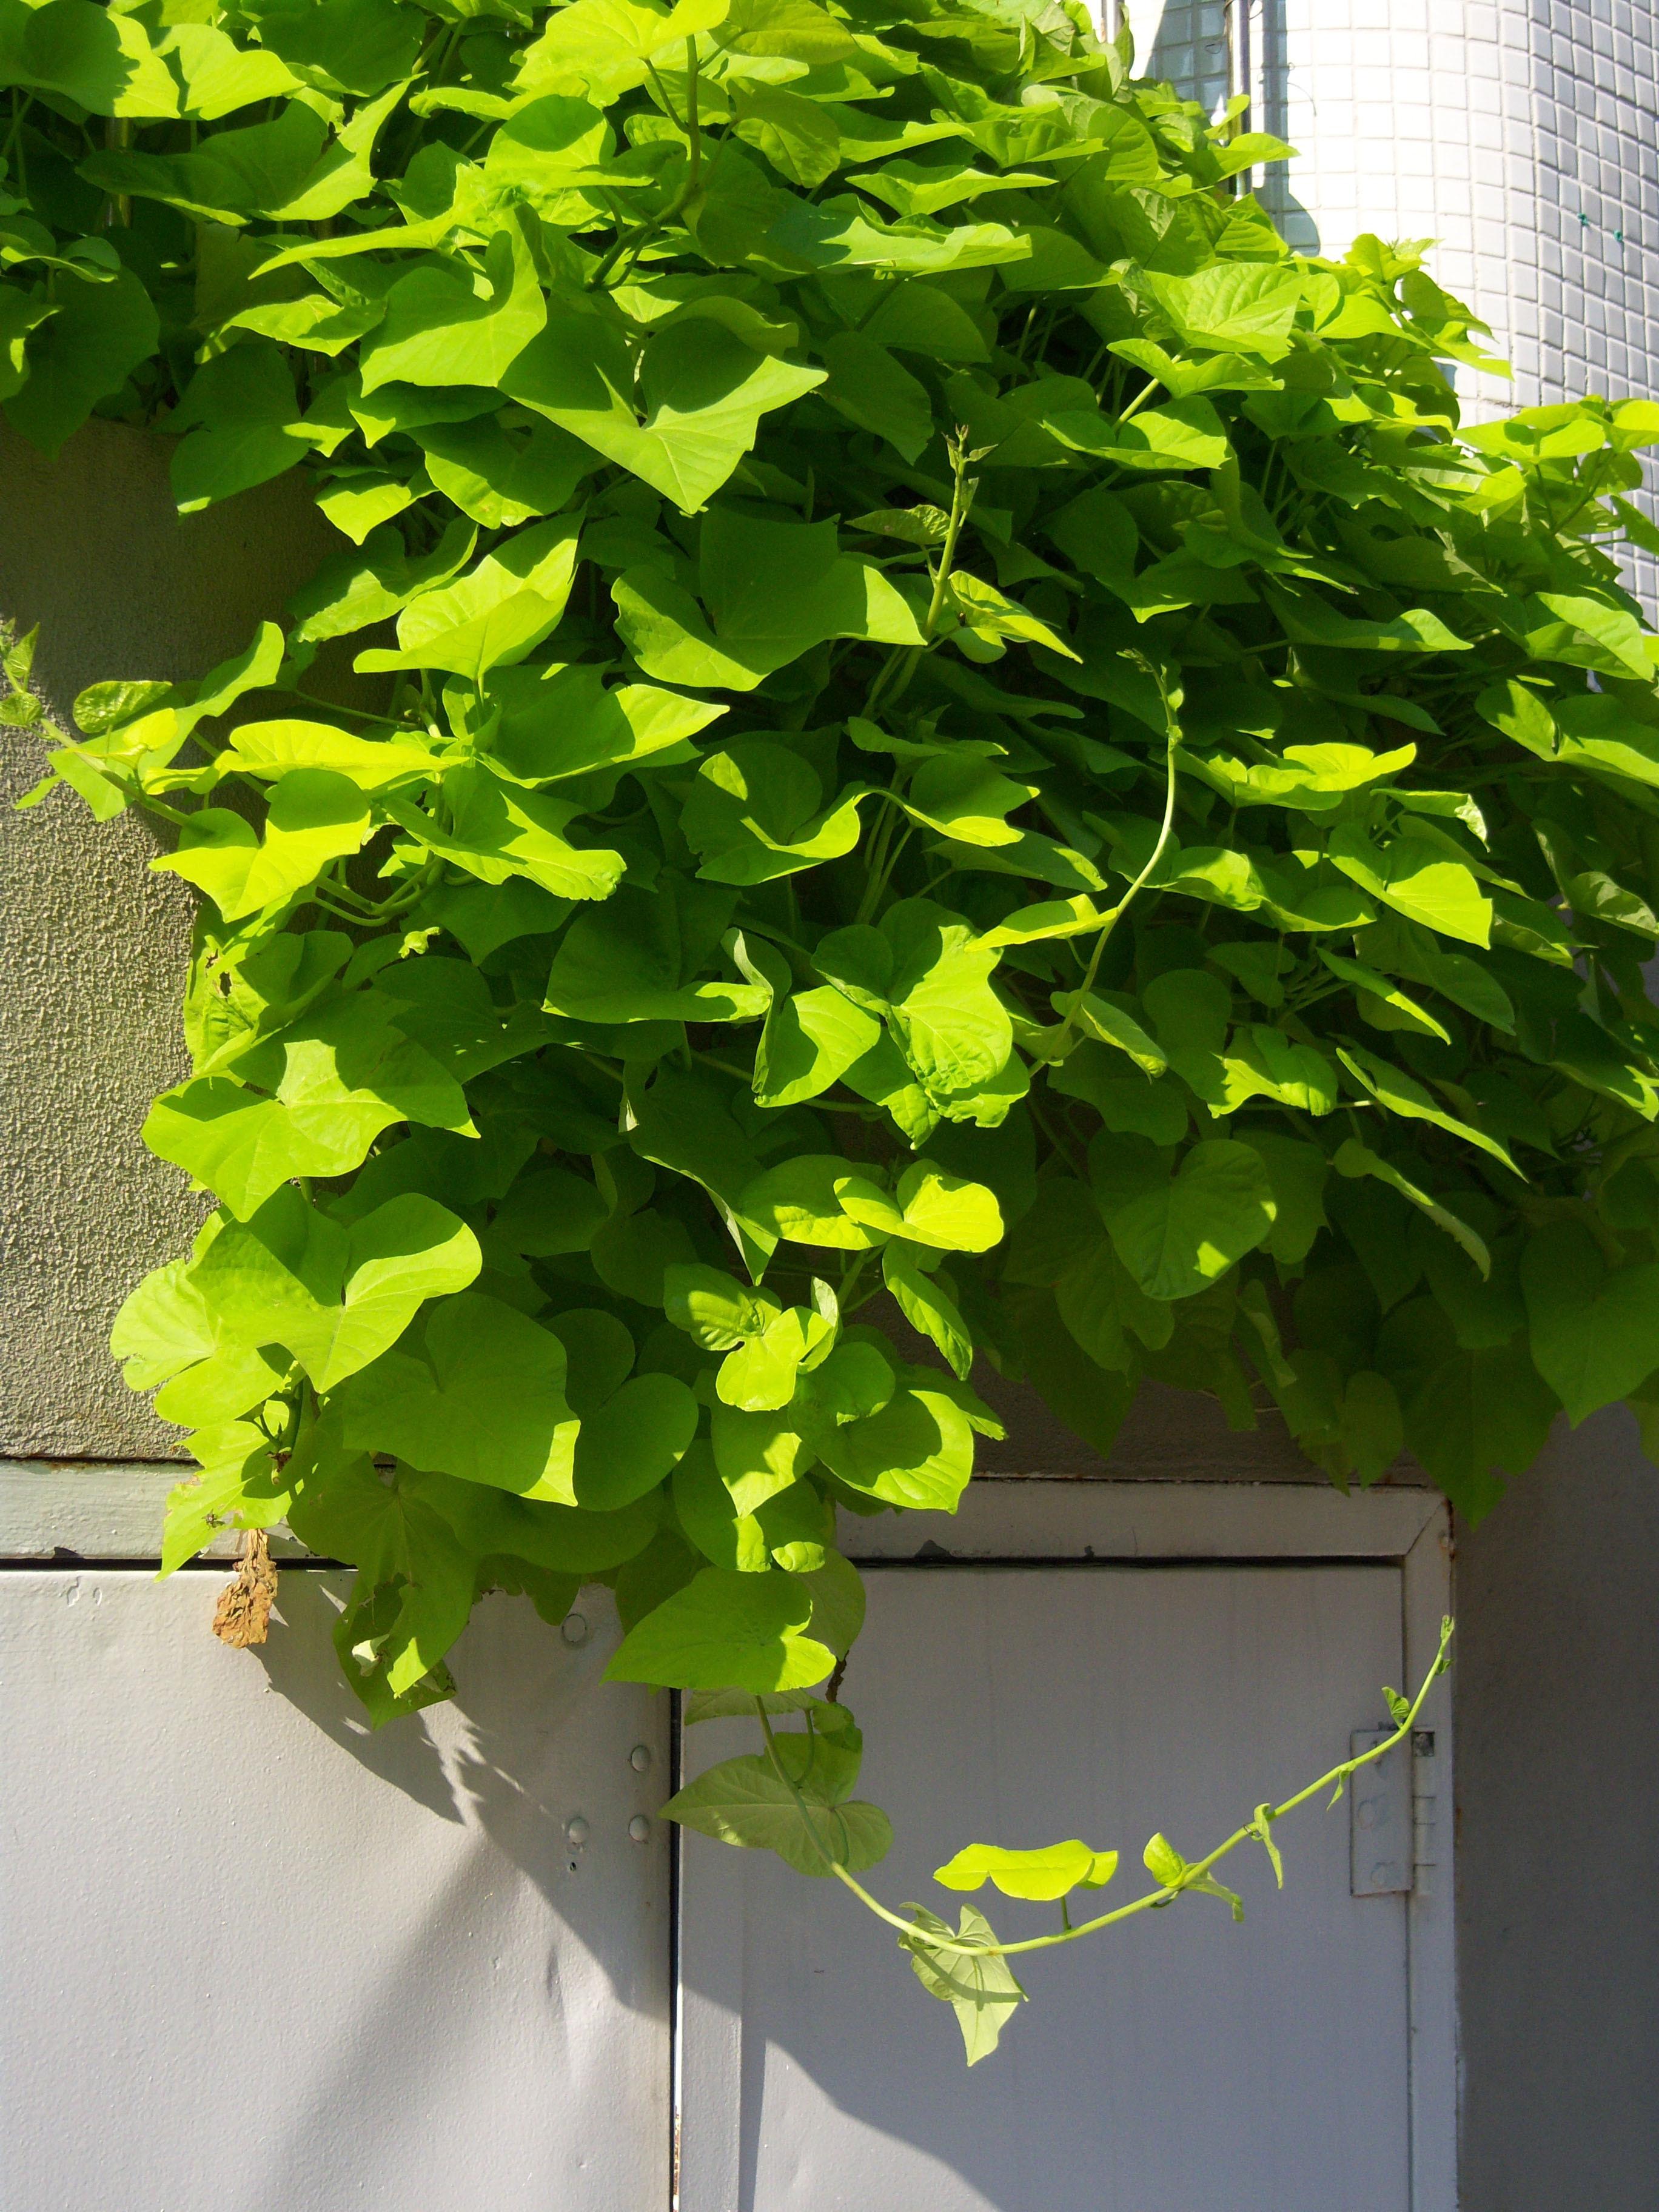 Potato Vine Plant  How to Grow Potato Vine Plant